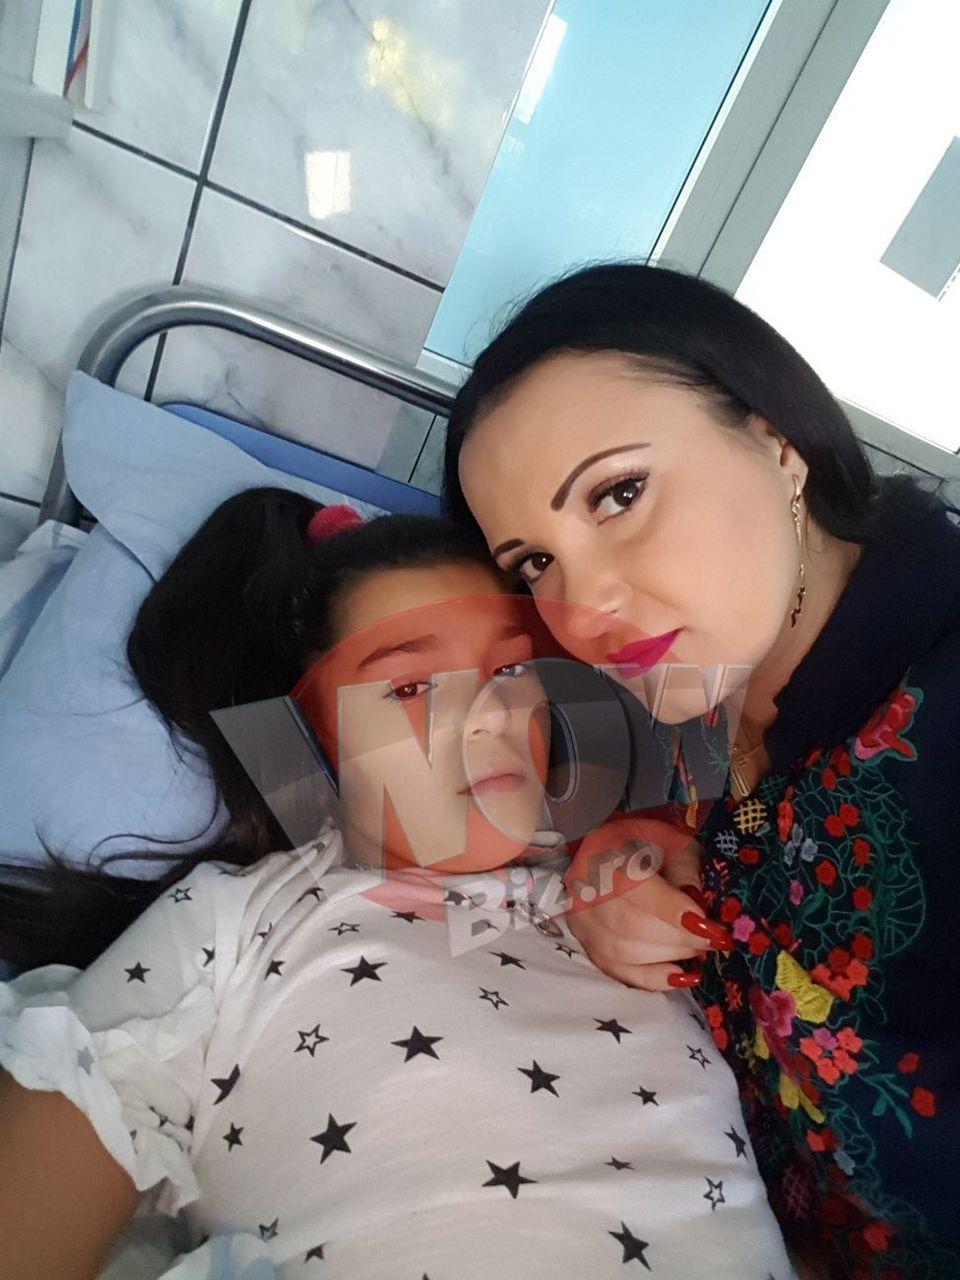 "Imagini care strang inima oricarei mame! Silvana Riciu, internata in spital cu fetita ei! ""Avea temperatura 40, nu se putea tine pe picioare, medicii fac investigatii"" Andrada e pe perfuzii FOTO EXCLUSIV"